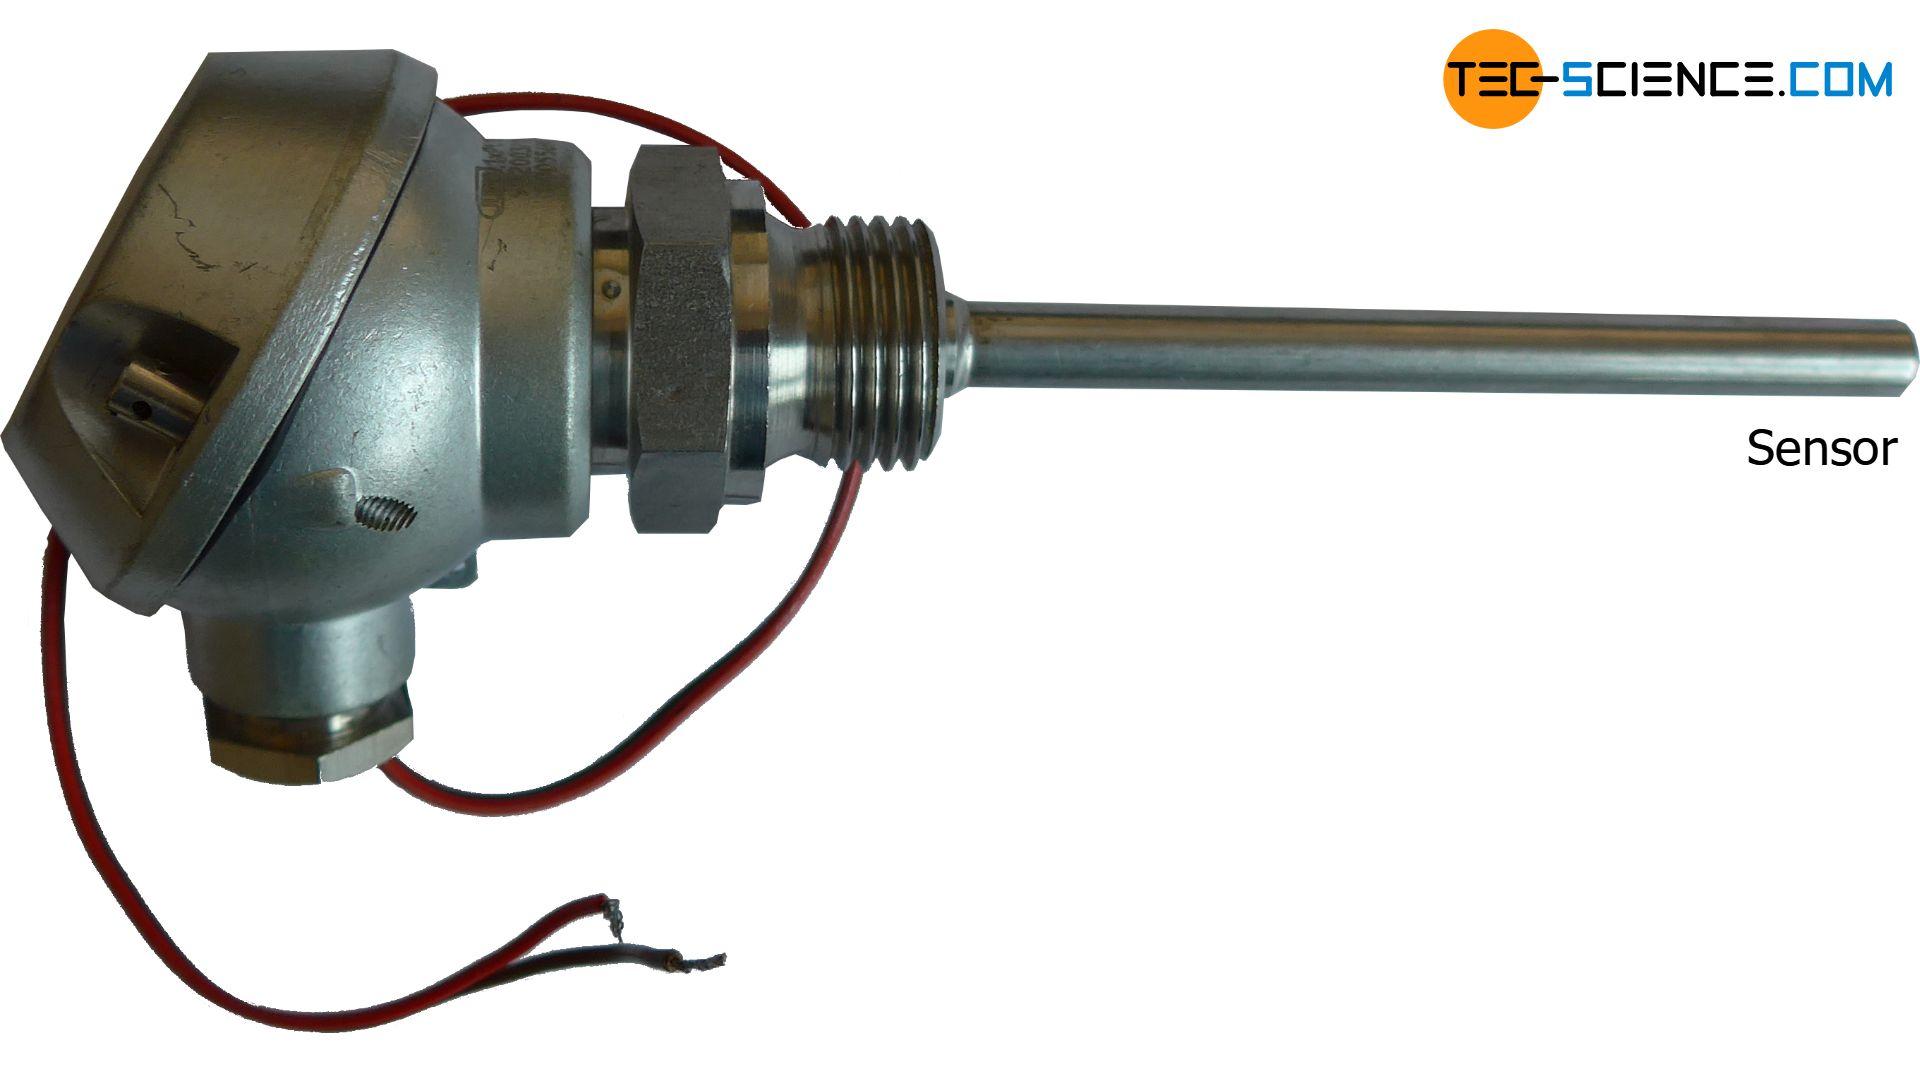 Widerstandsthermometer (Pt100)